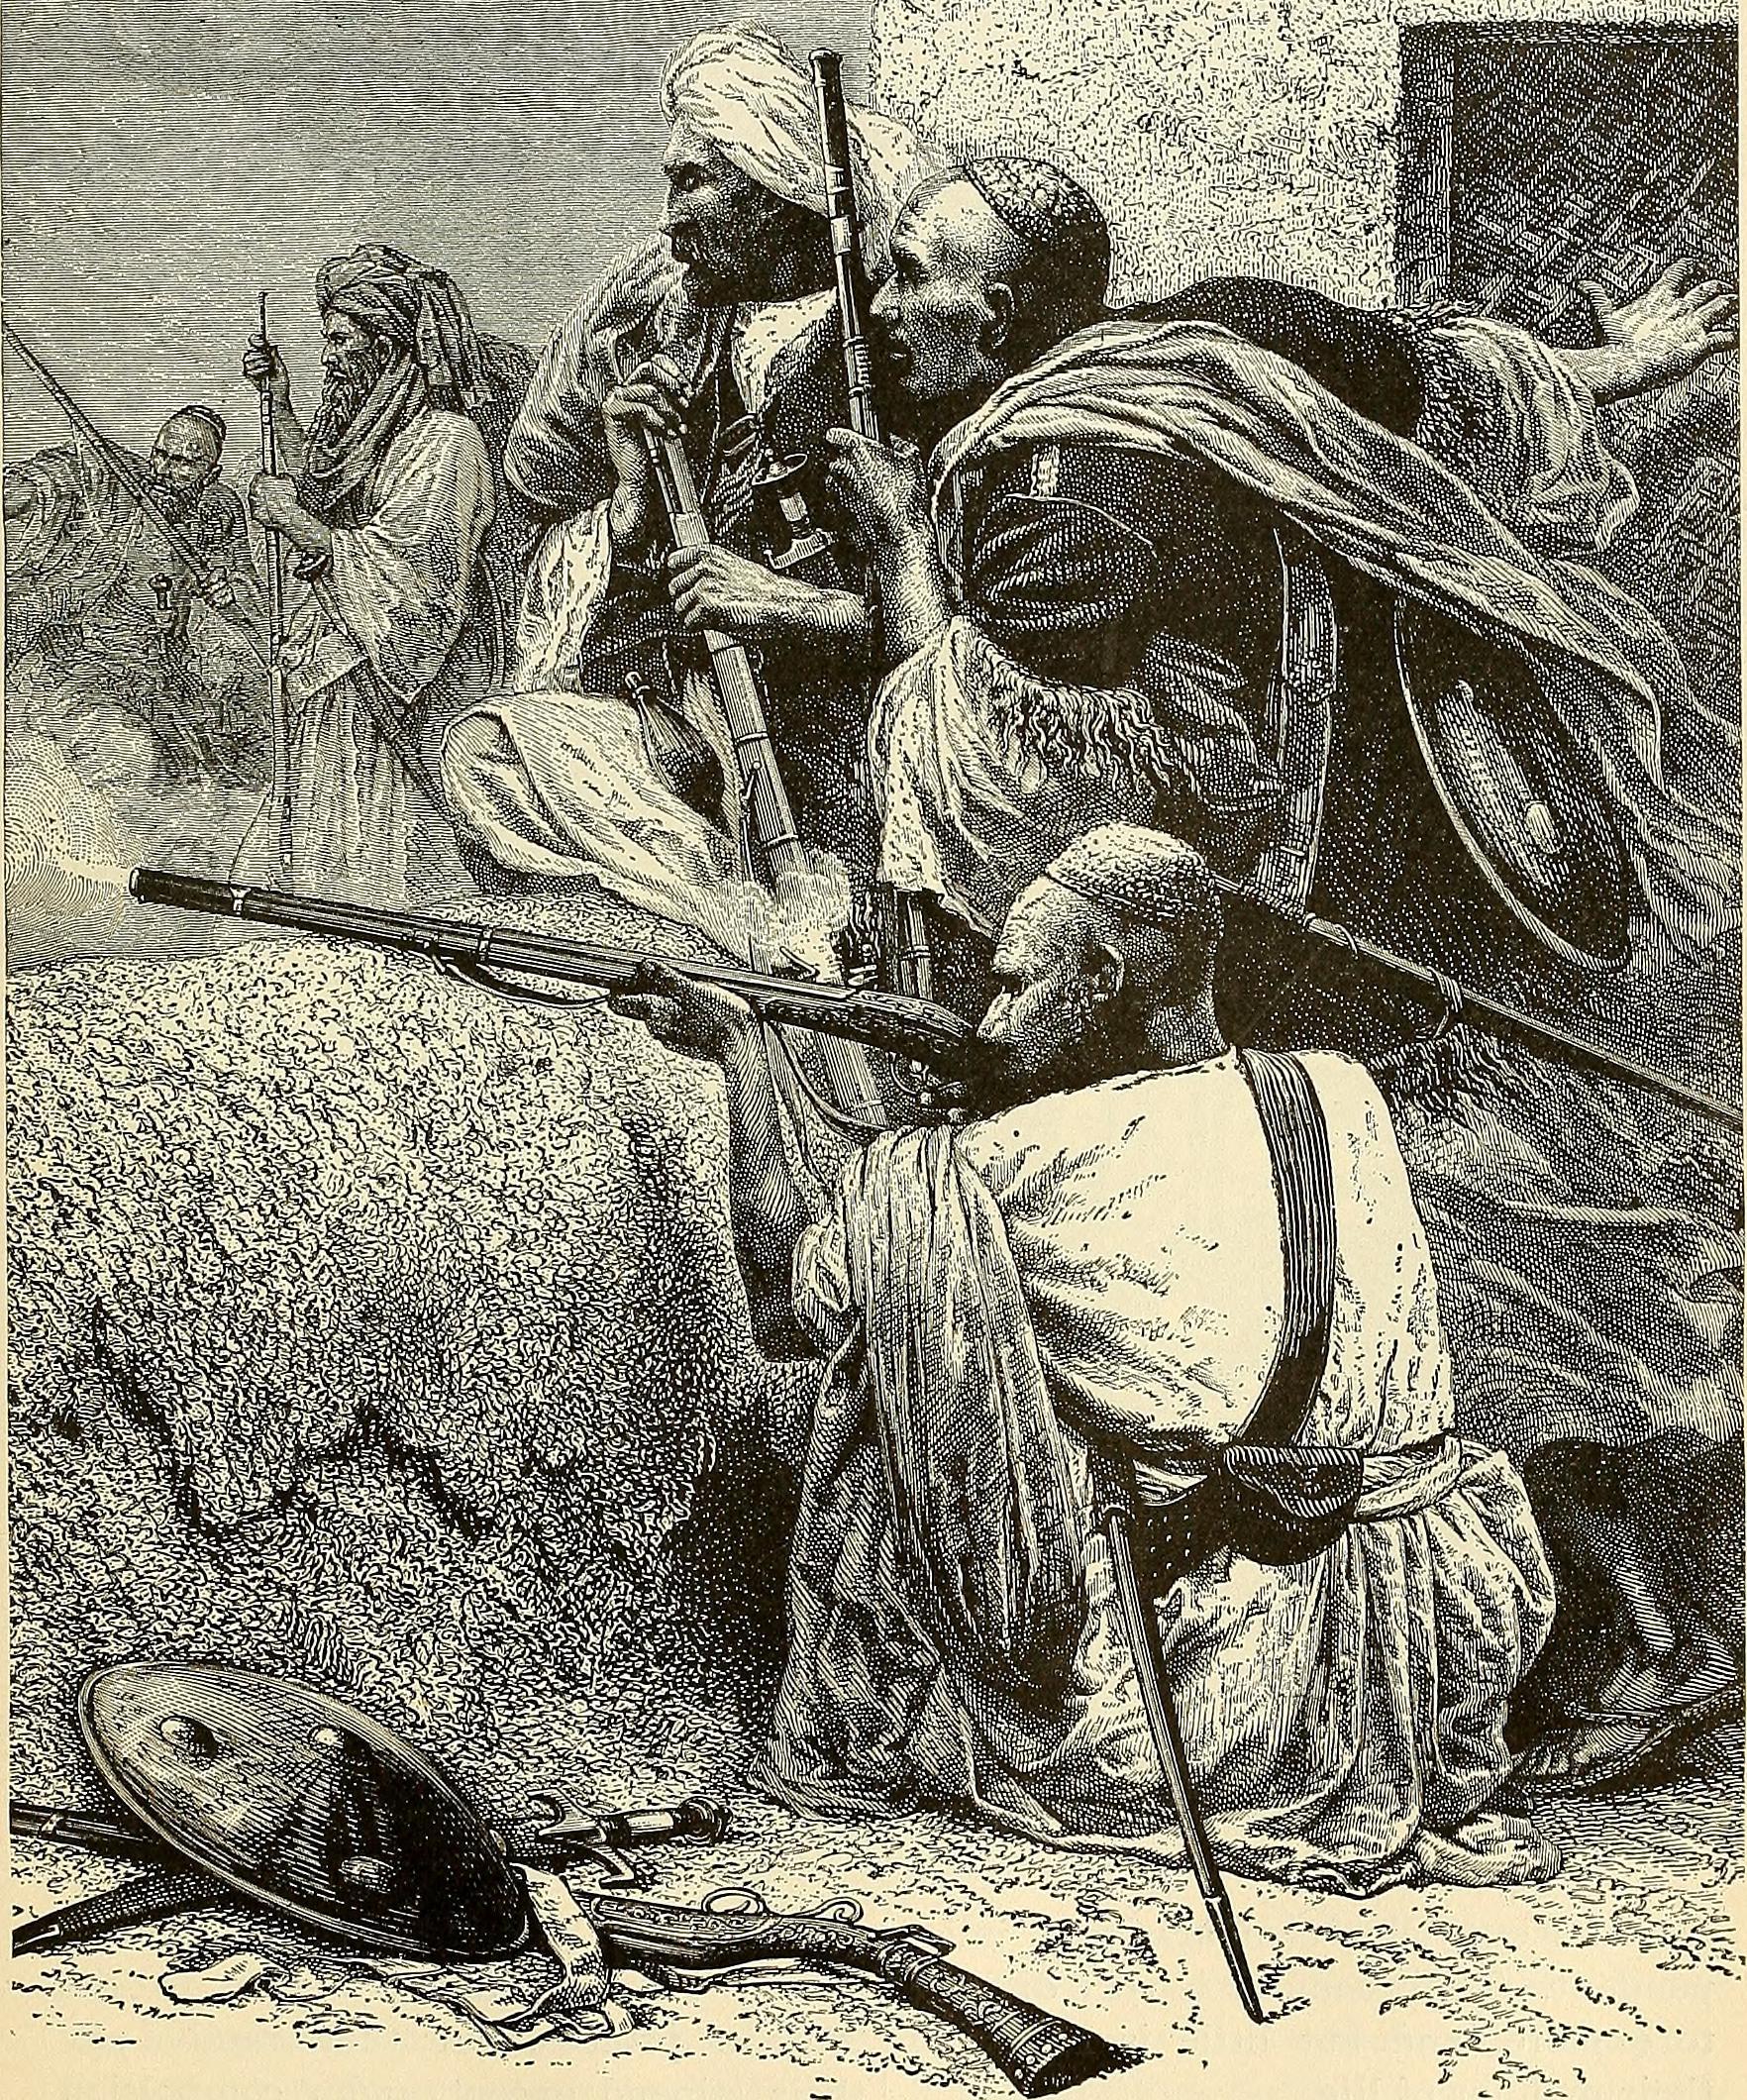 Yusufzai - Wikipedia